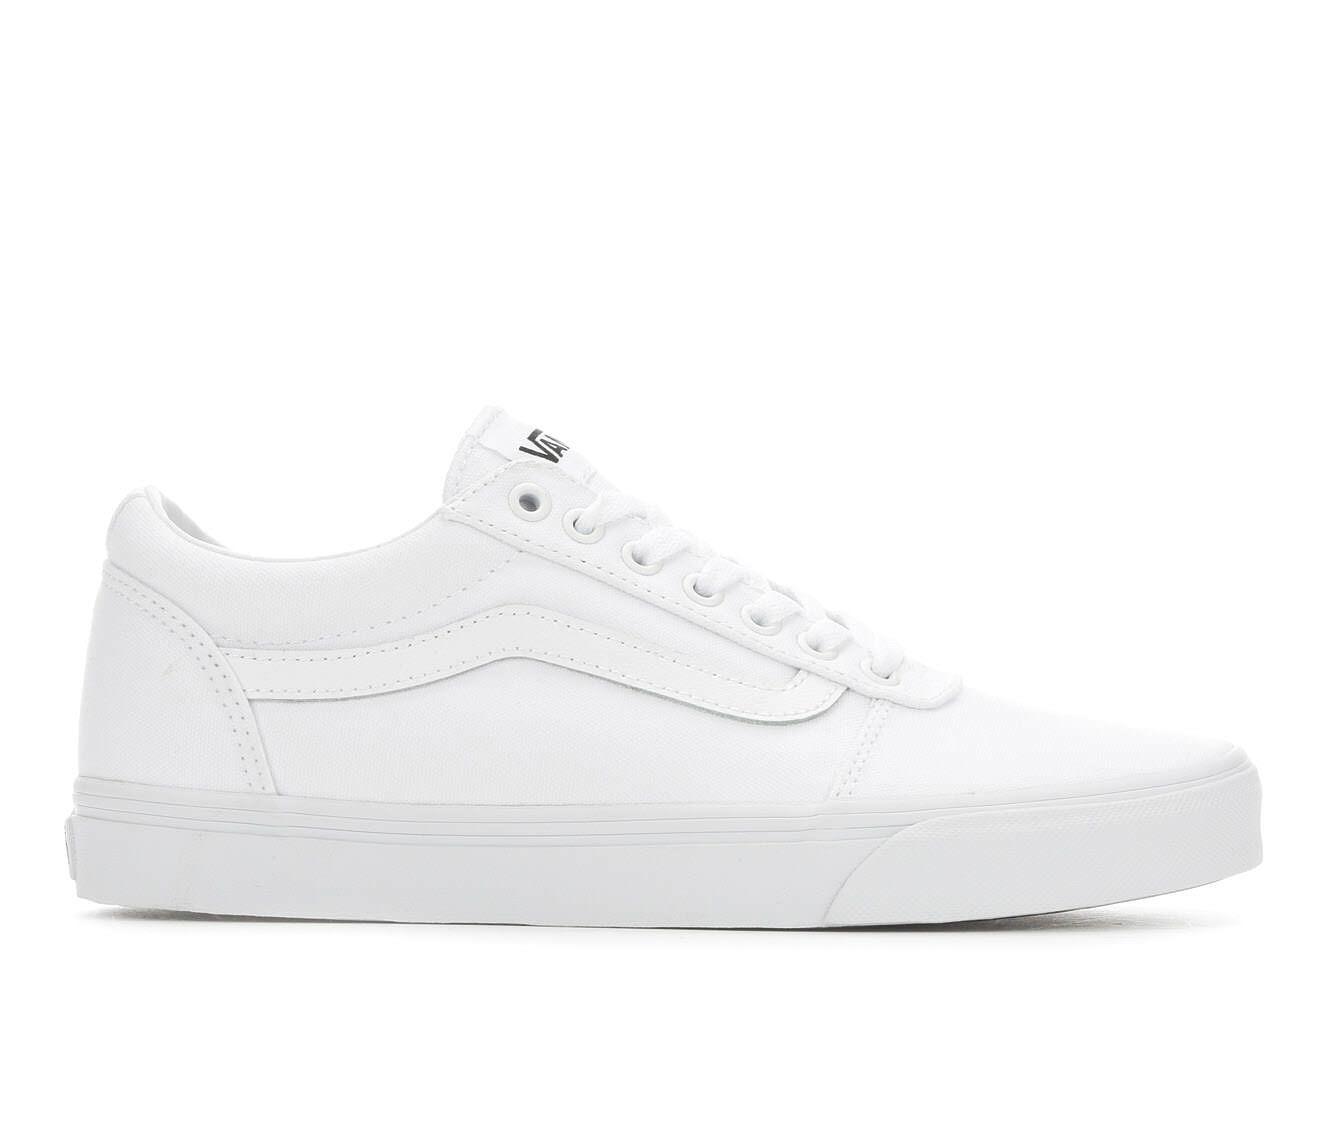 Excellent Quality Men's Vans Ward Skate Shoes White/White